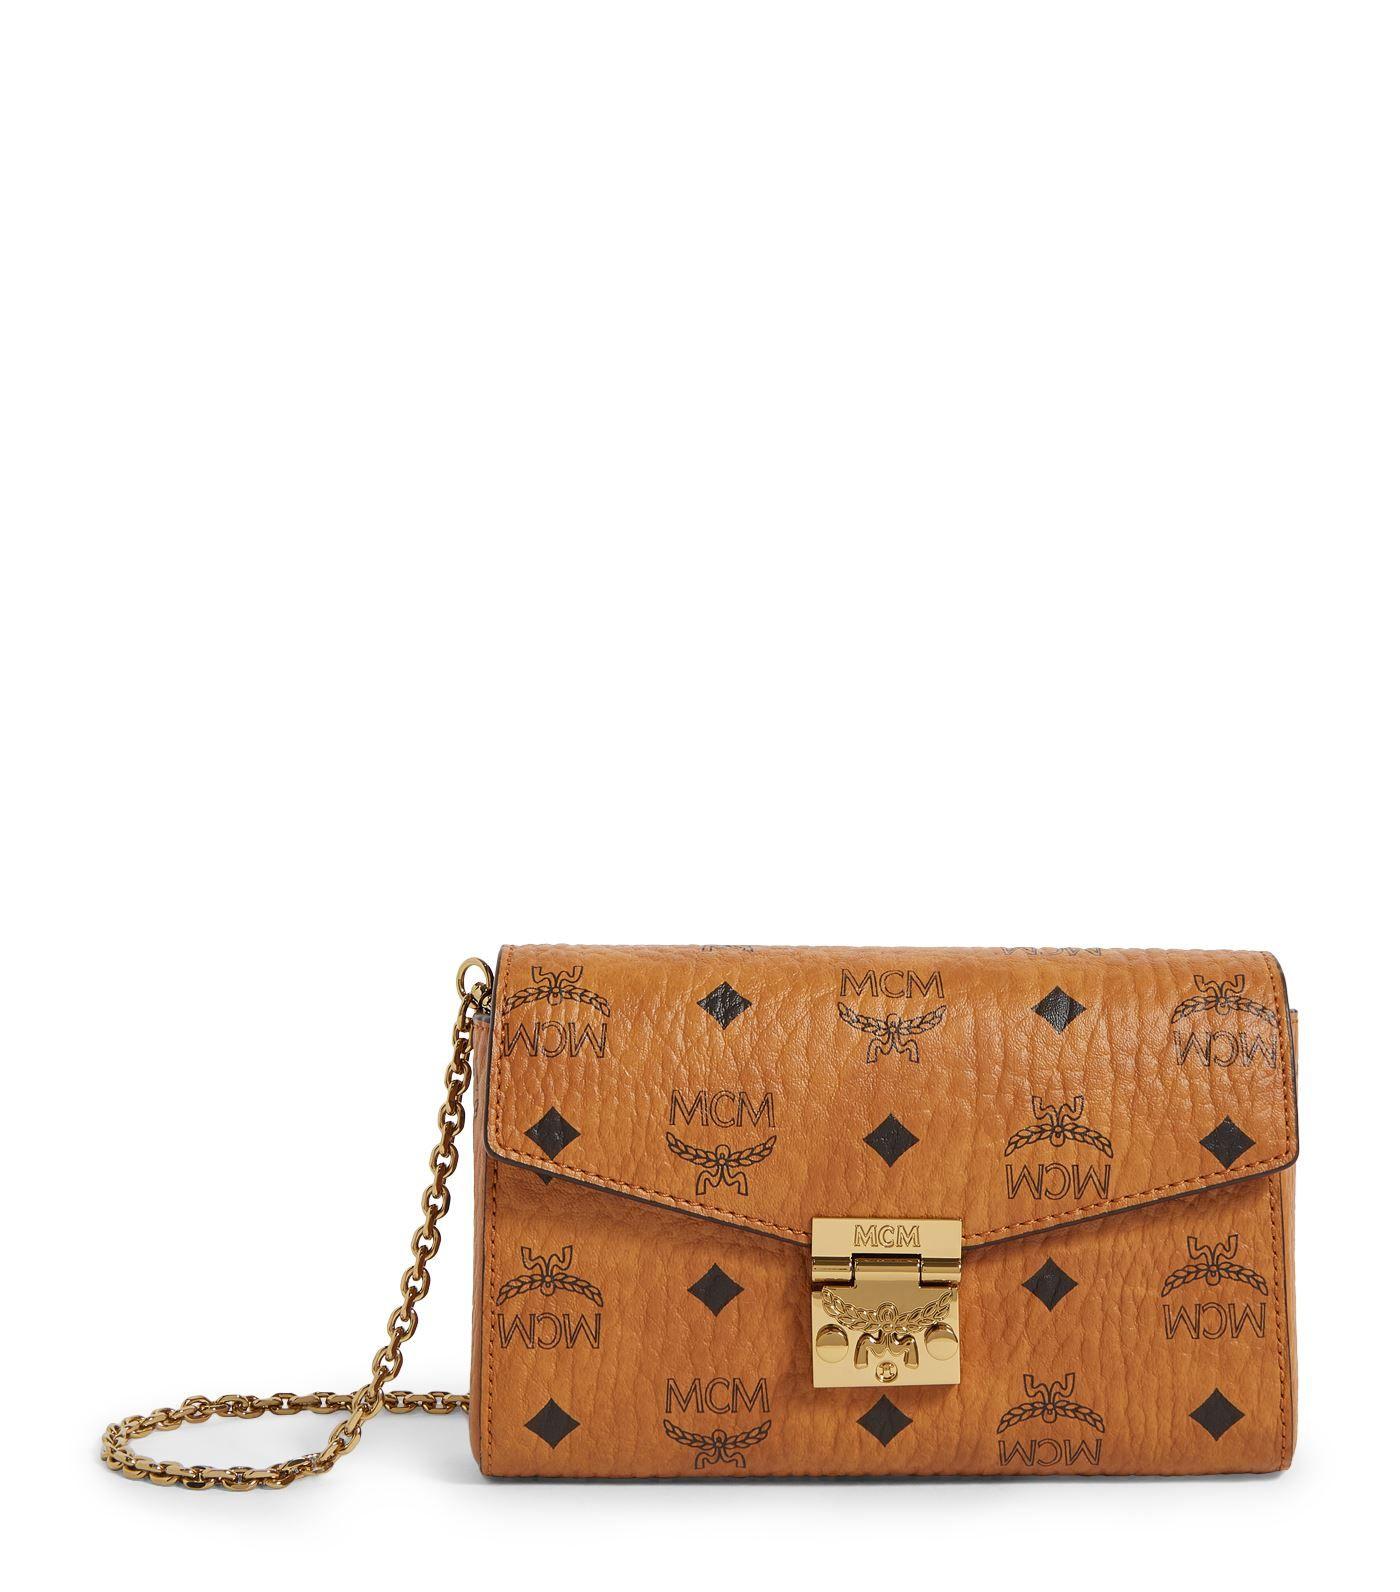 MCM Small Visetos Millie Cross Body Bag #AD , #Aff, #Visetos